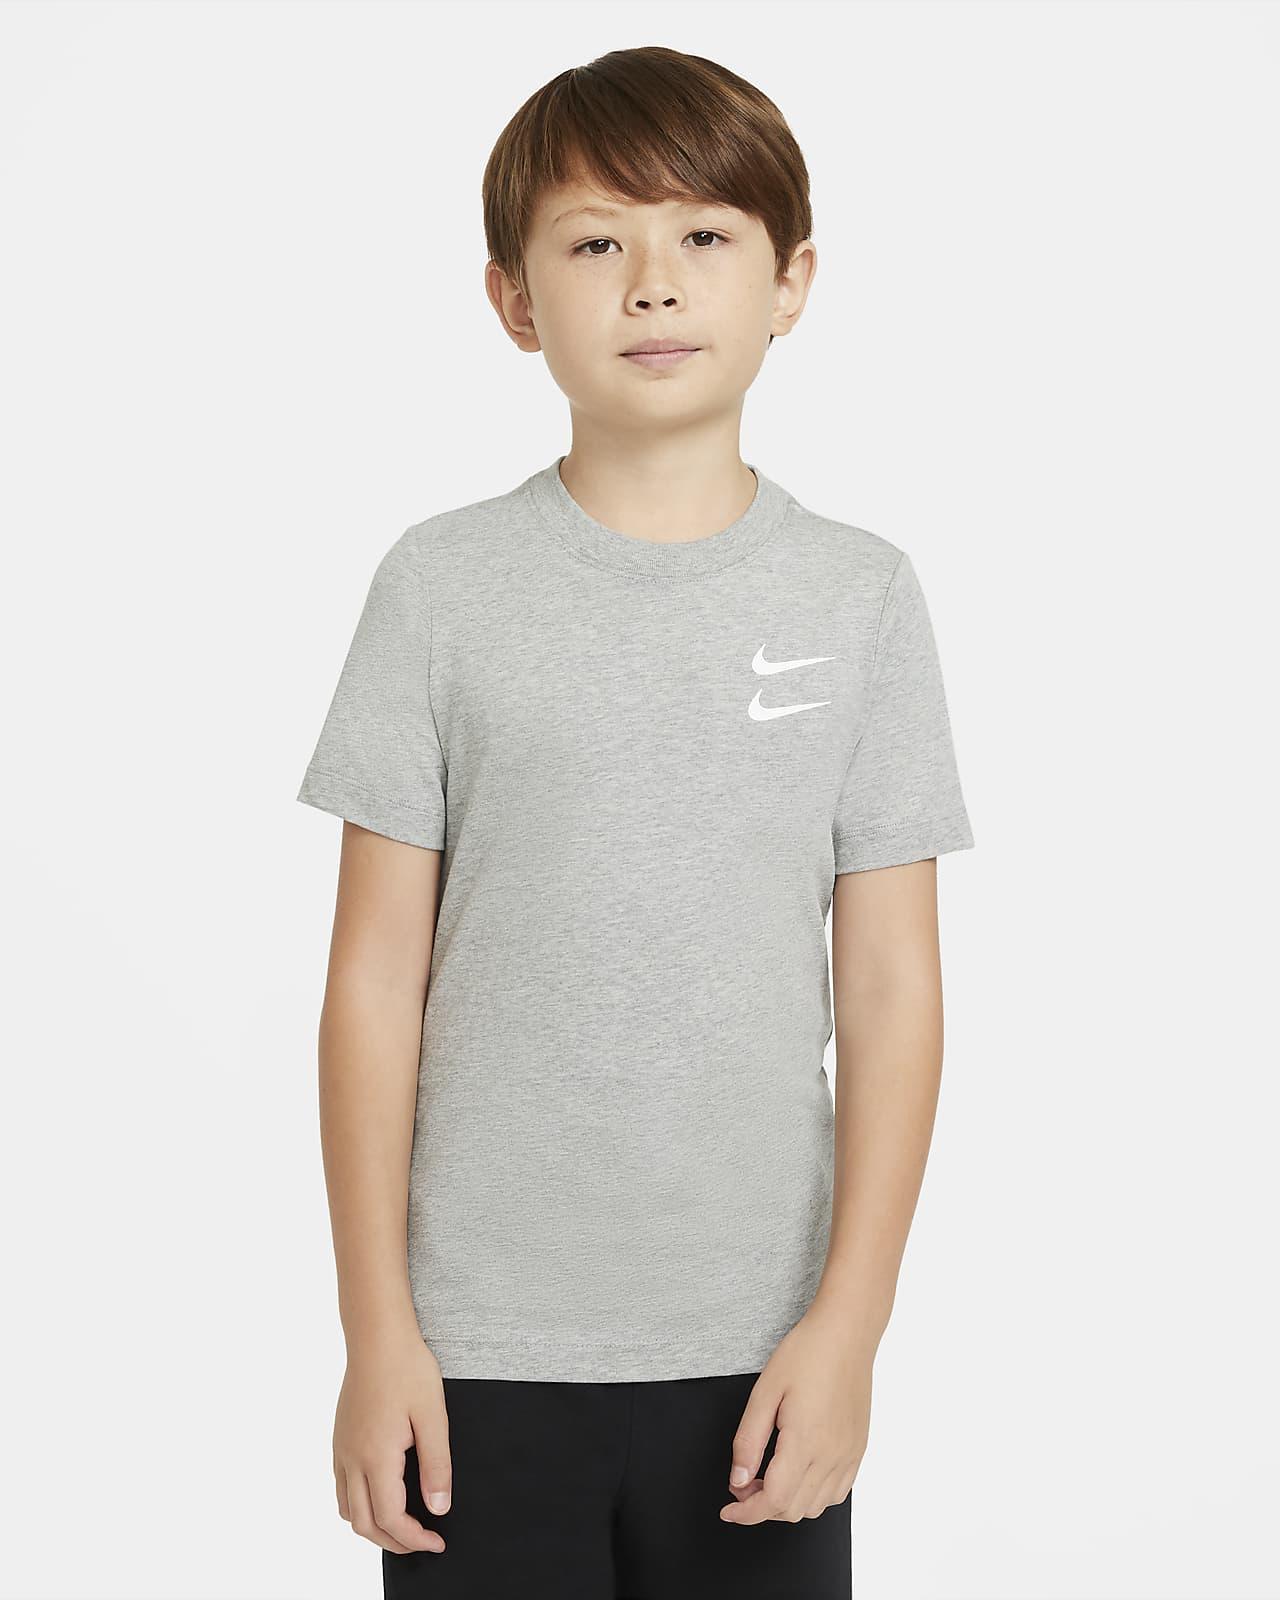 Nike Sportswear-T-shirt til store børn (drenge)